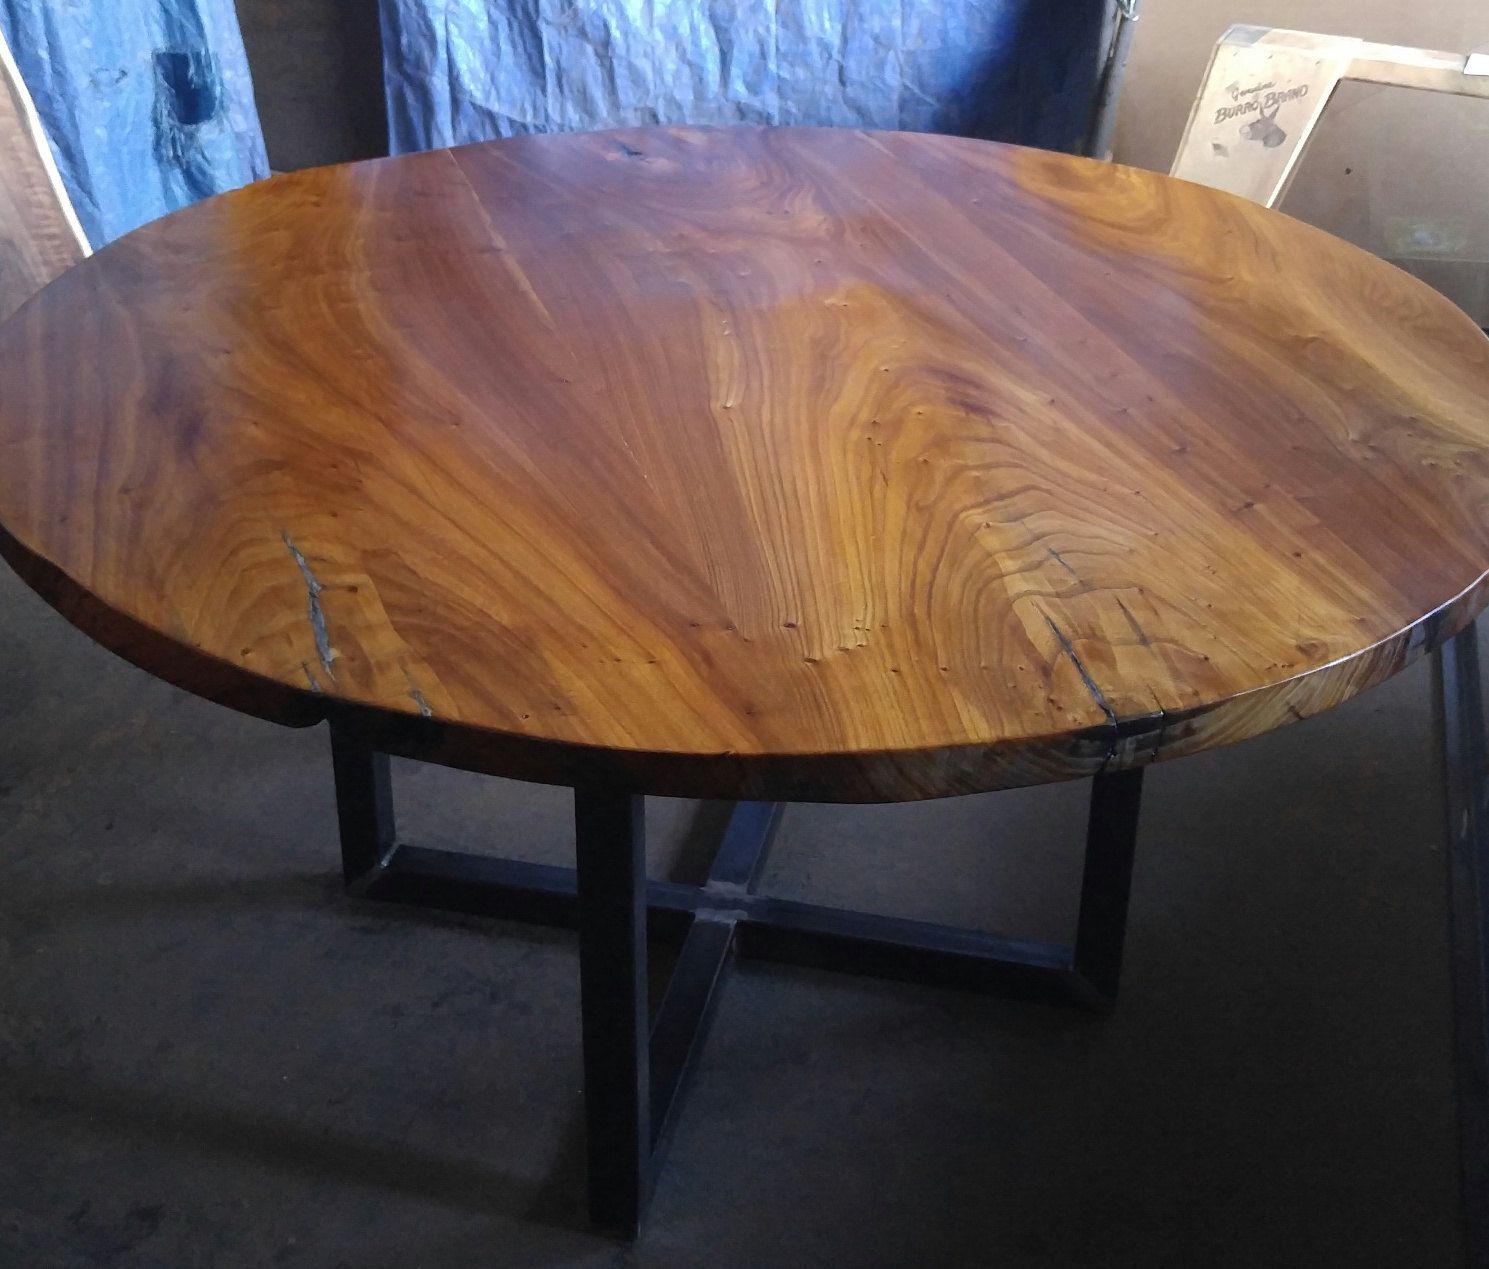 The Siberian Circle Table Top Round Table Dining Table Wood Table Elm Walnut Siberian Elm Hardwood Slab Dining Tables Wood Slab Dining Table Wood Table Lights